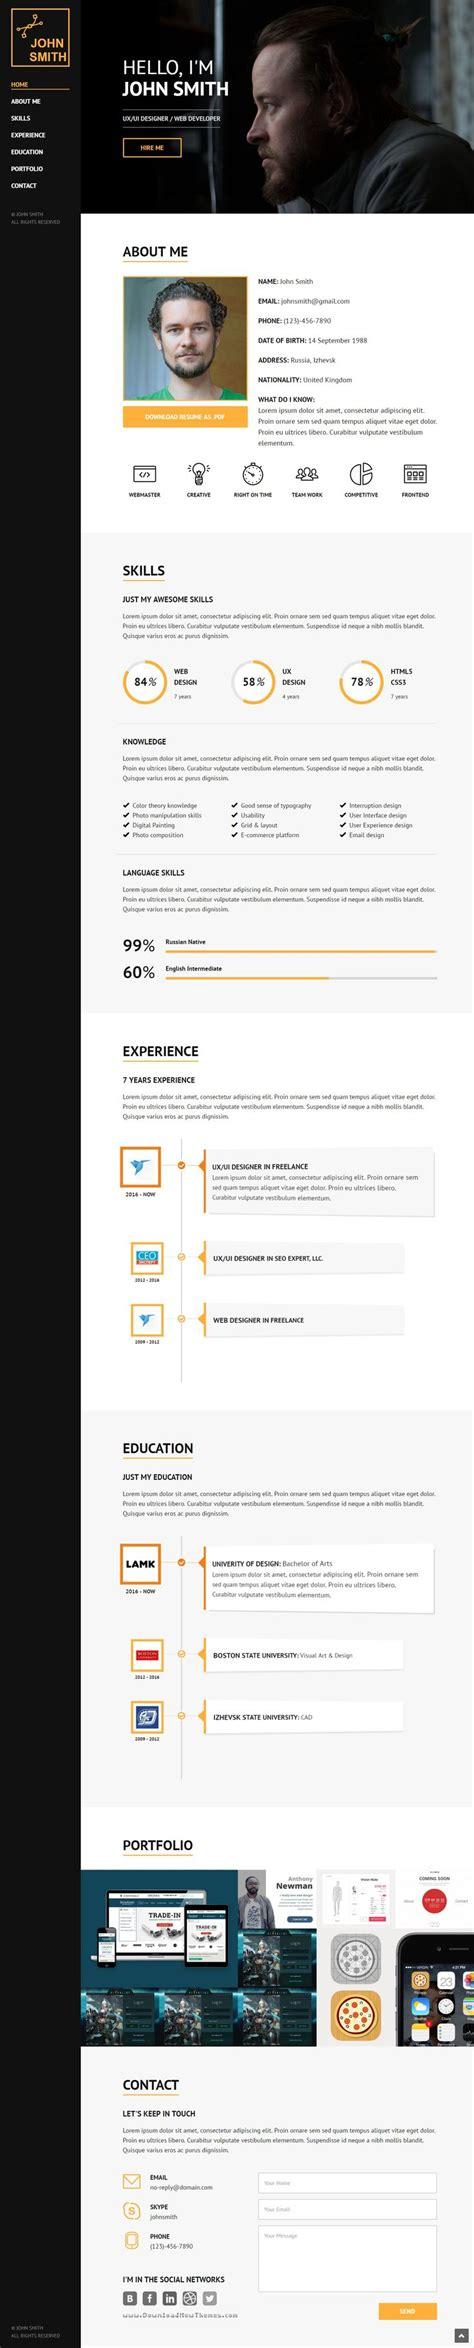 best 25 web designer resume ideas on